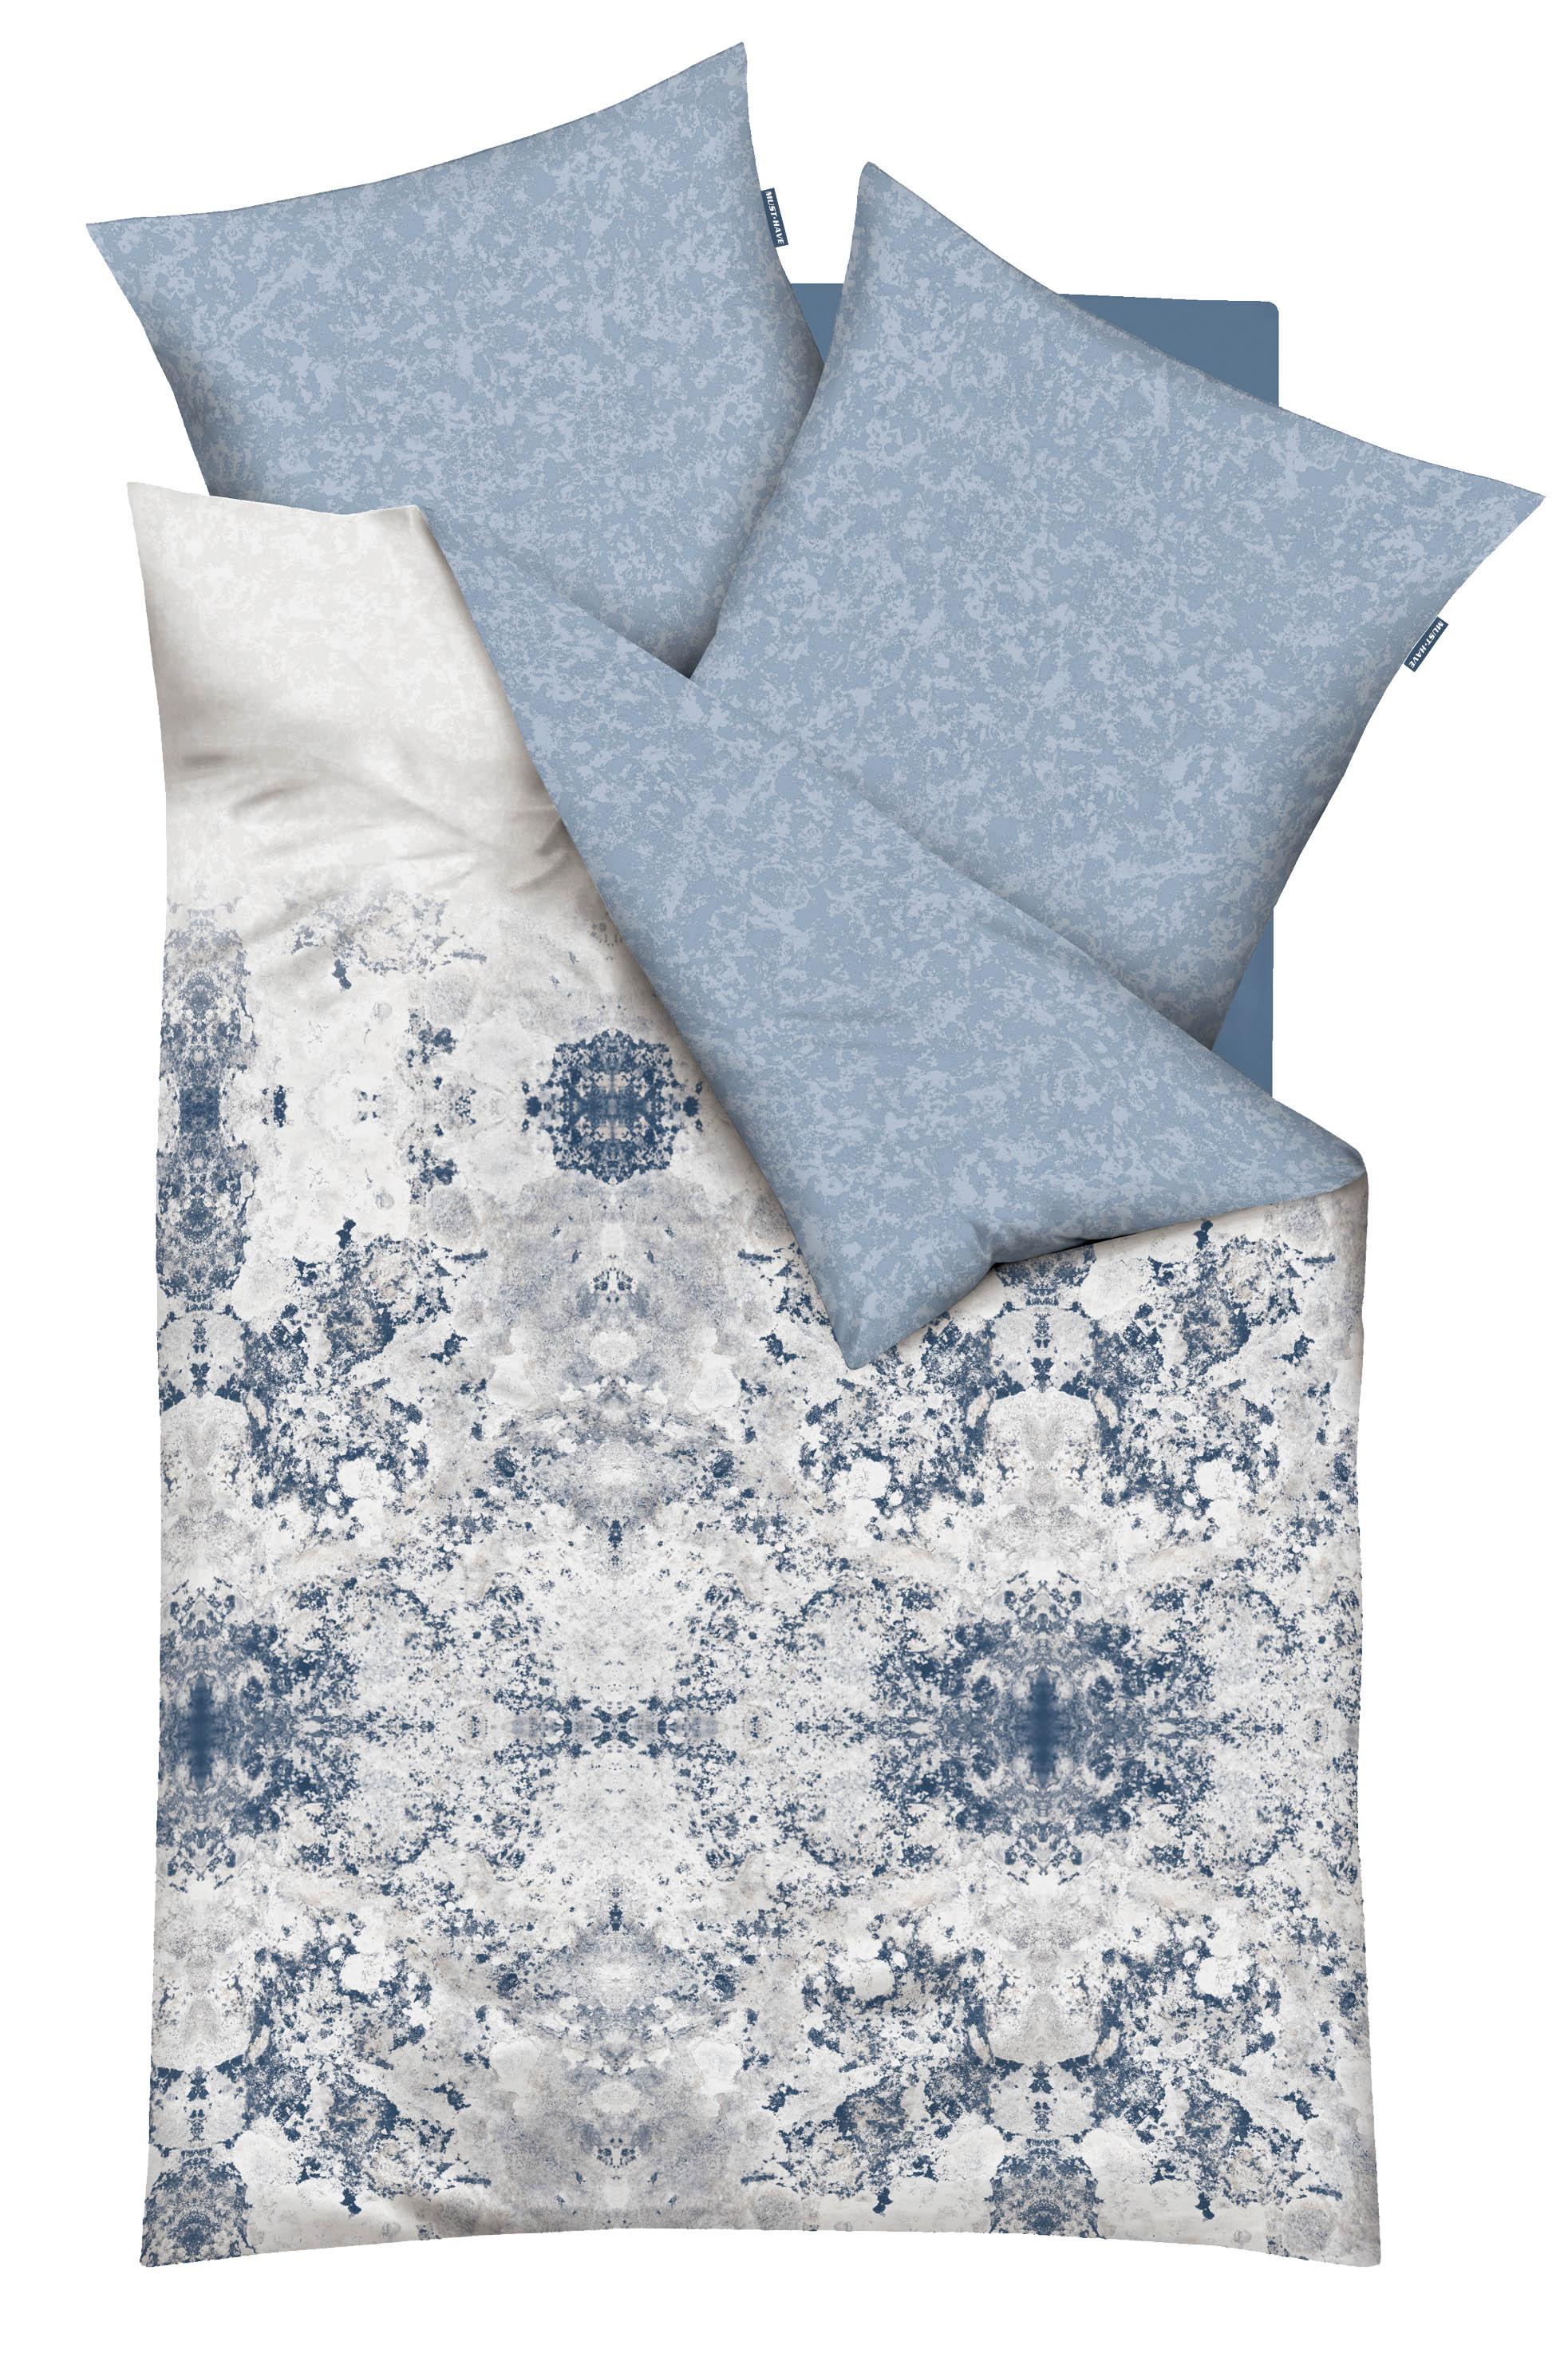 bettw sche 135x200 cm must have 790 631 hellblau mako. Black Bedroom Furniture Sets. Home Design Ideas